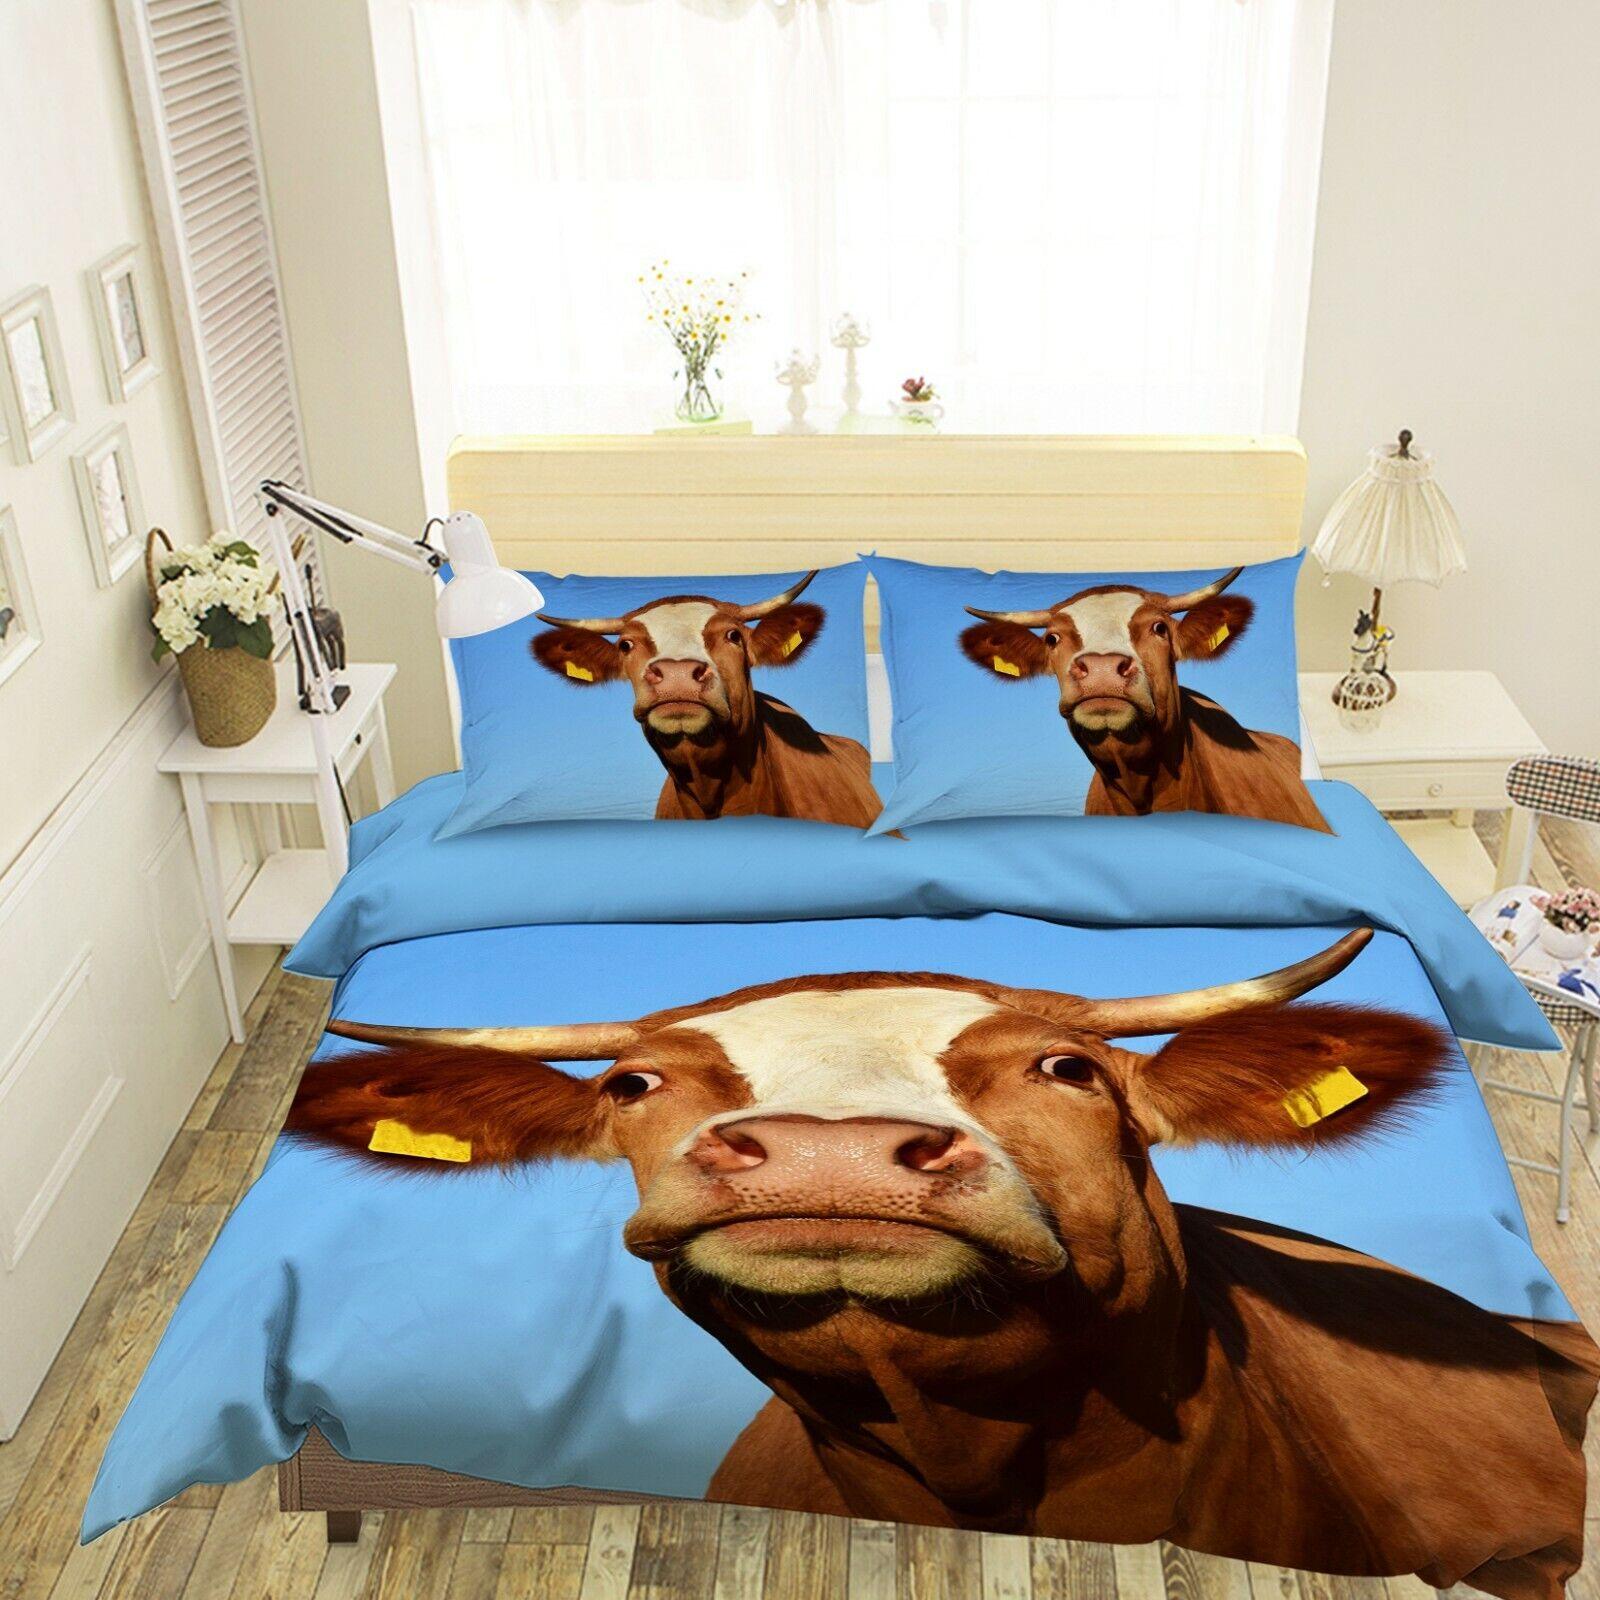 3D braun Cow N29 Animal Bett Pillowcases Quilt Duvet Startseite Königin König Amy